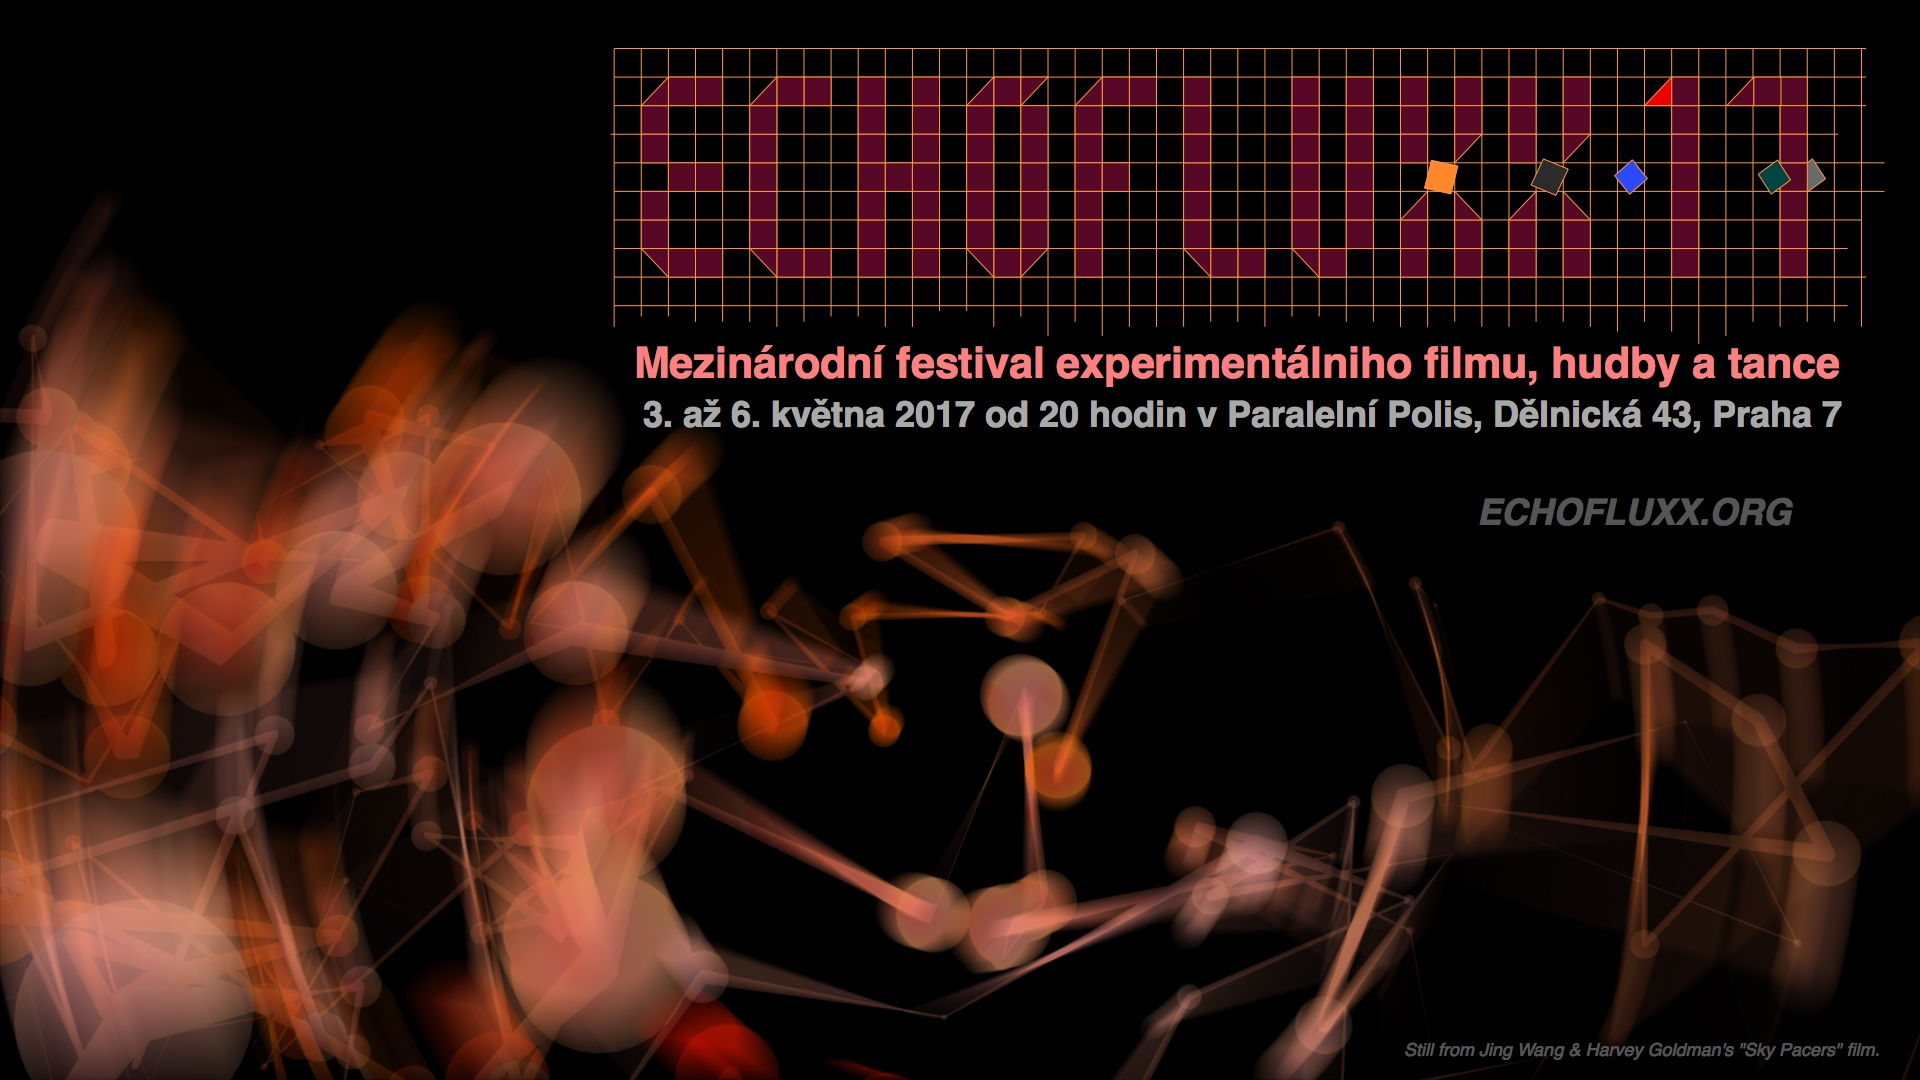 Echofluxx 17 Festival of New Media Art and Music Paralelni Polis